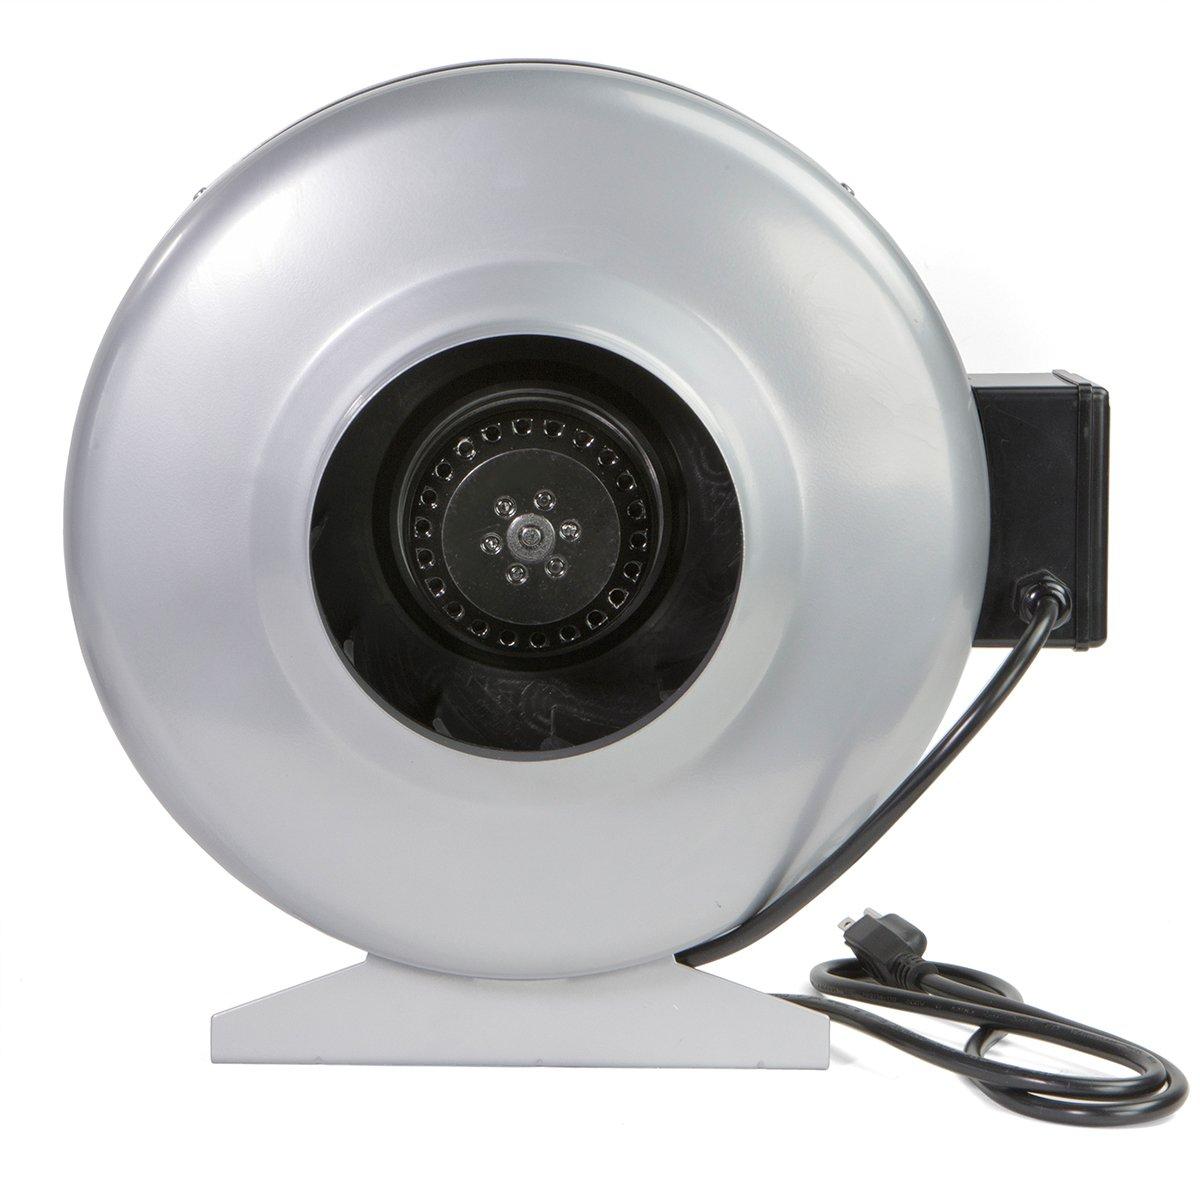 XtremepowerUS Inline Duct 6'' 440CFM Fan, Sliver